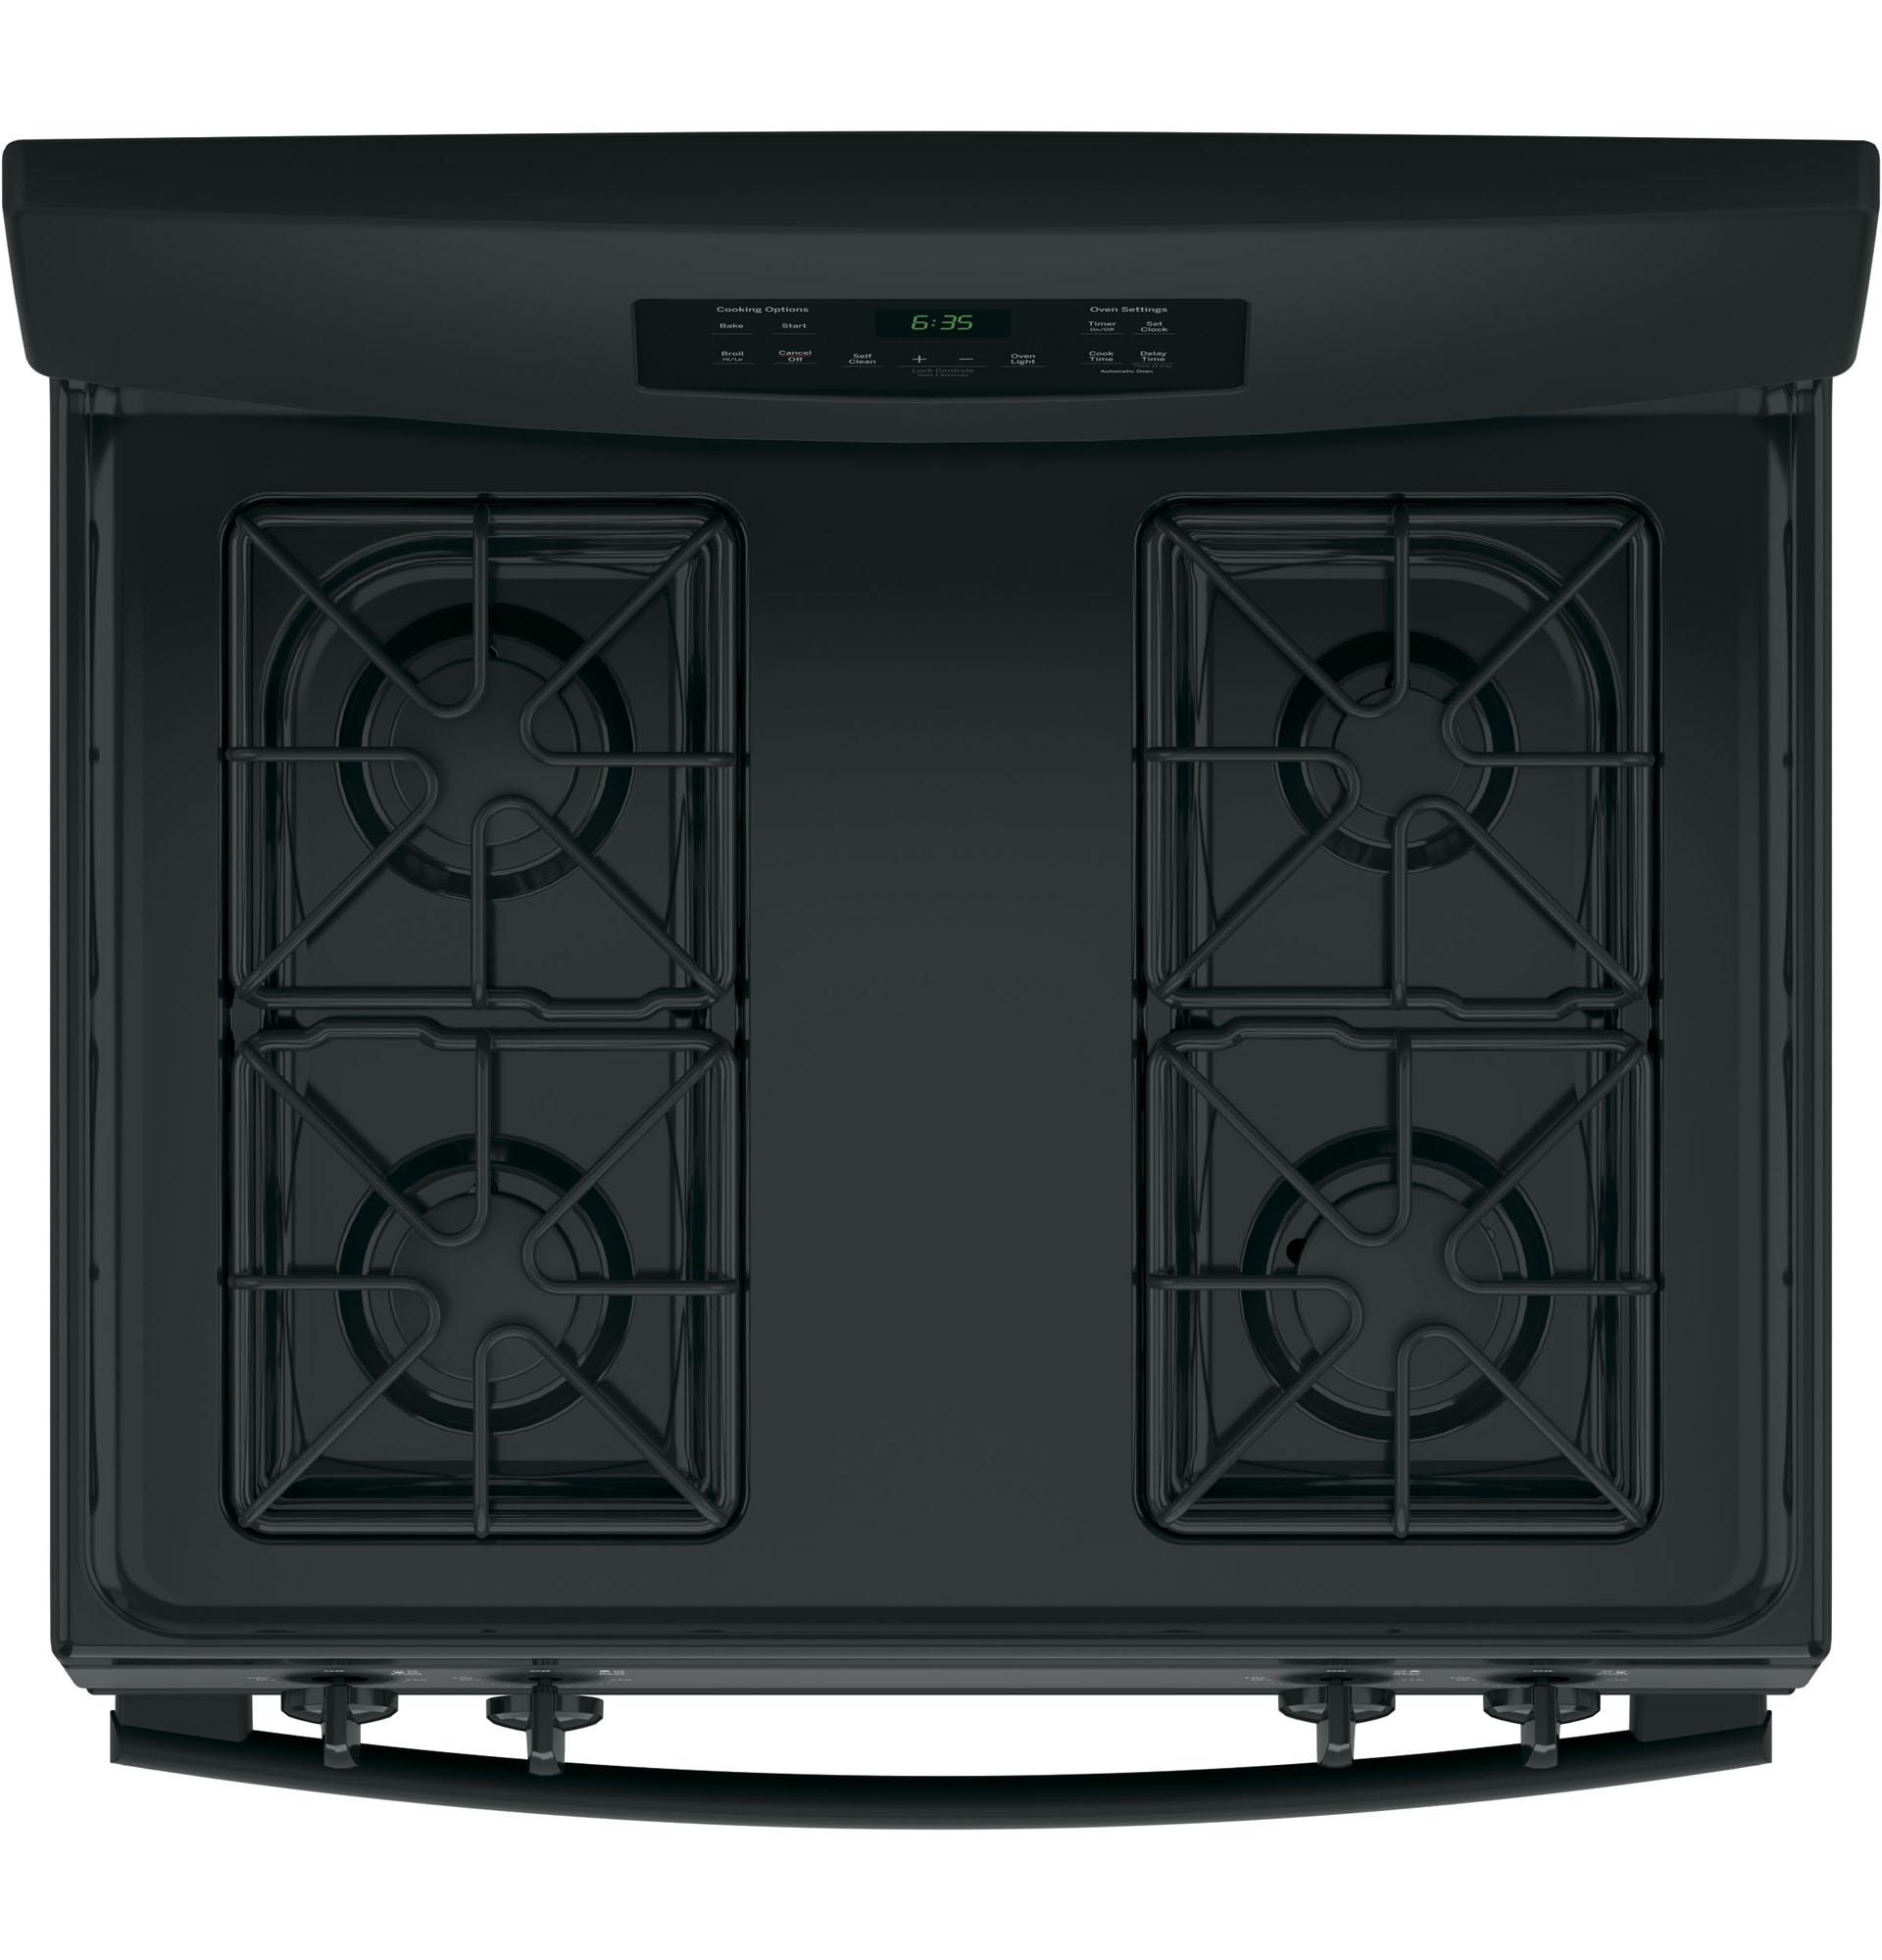 "GE Appliances JGB635DEKBB 30"" Freestanding Gas Range - Black"